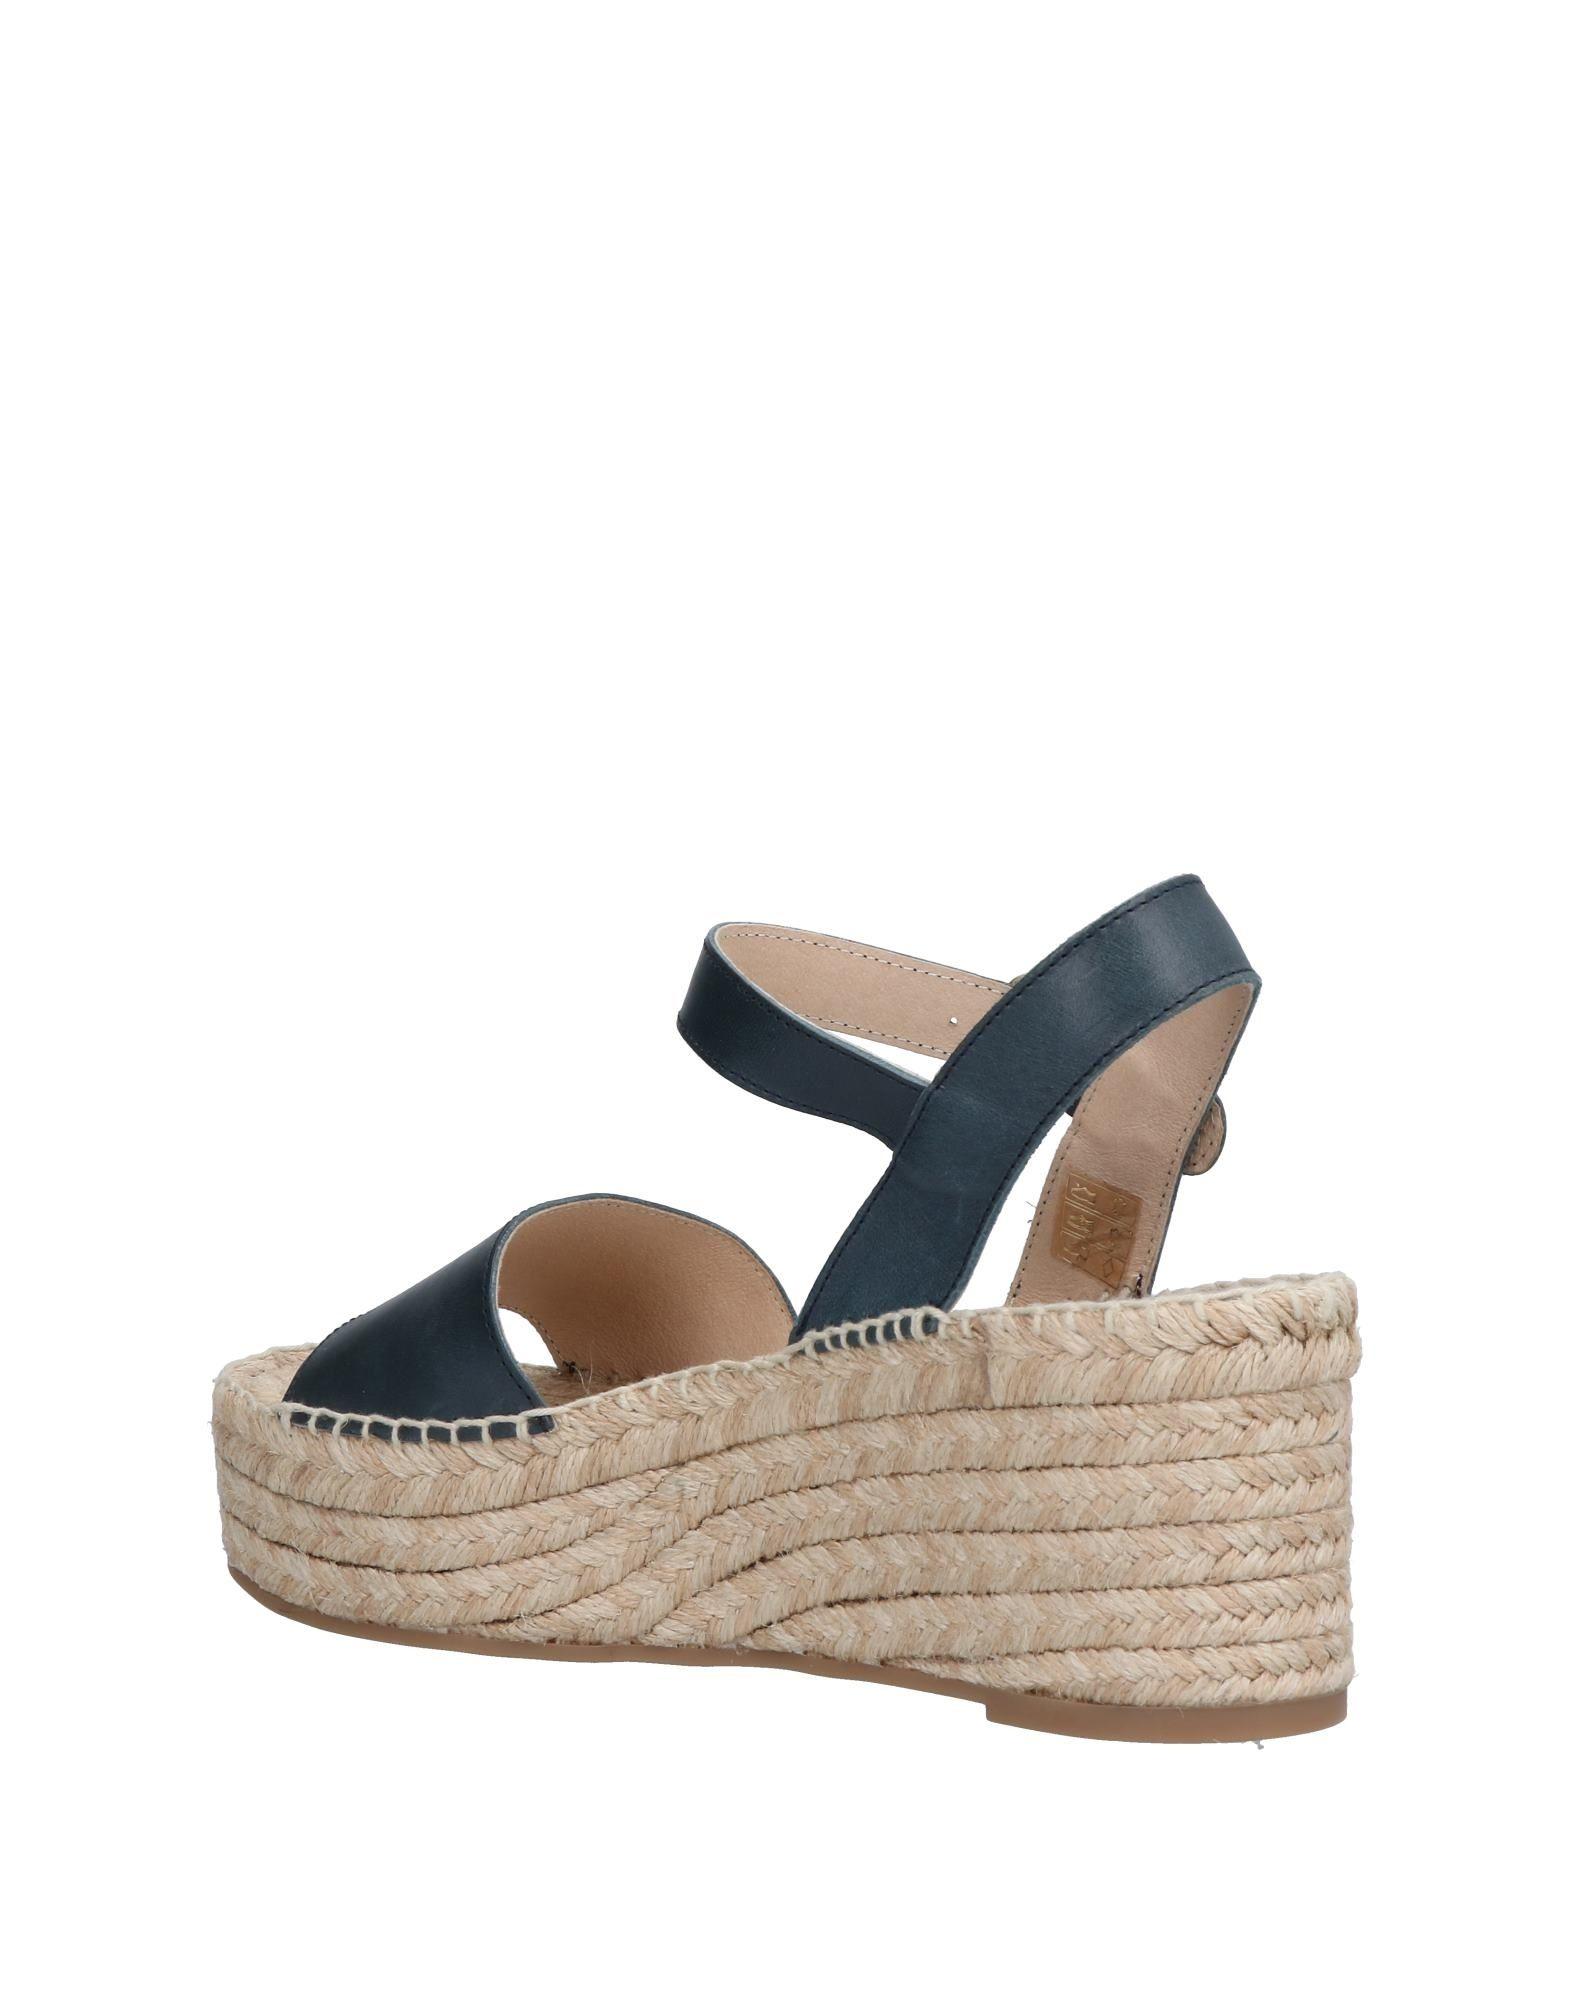 8dc1321338f ... Panella Sandals - Women Panella Sandals online on Canada Canada Canada  - 11474086JK 25b589 ...